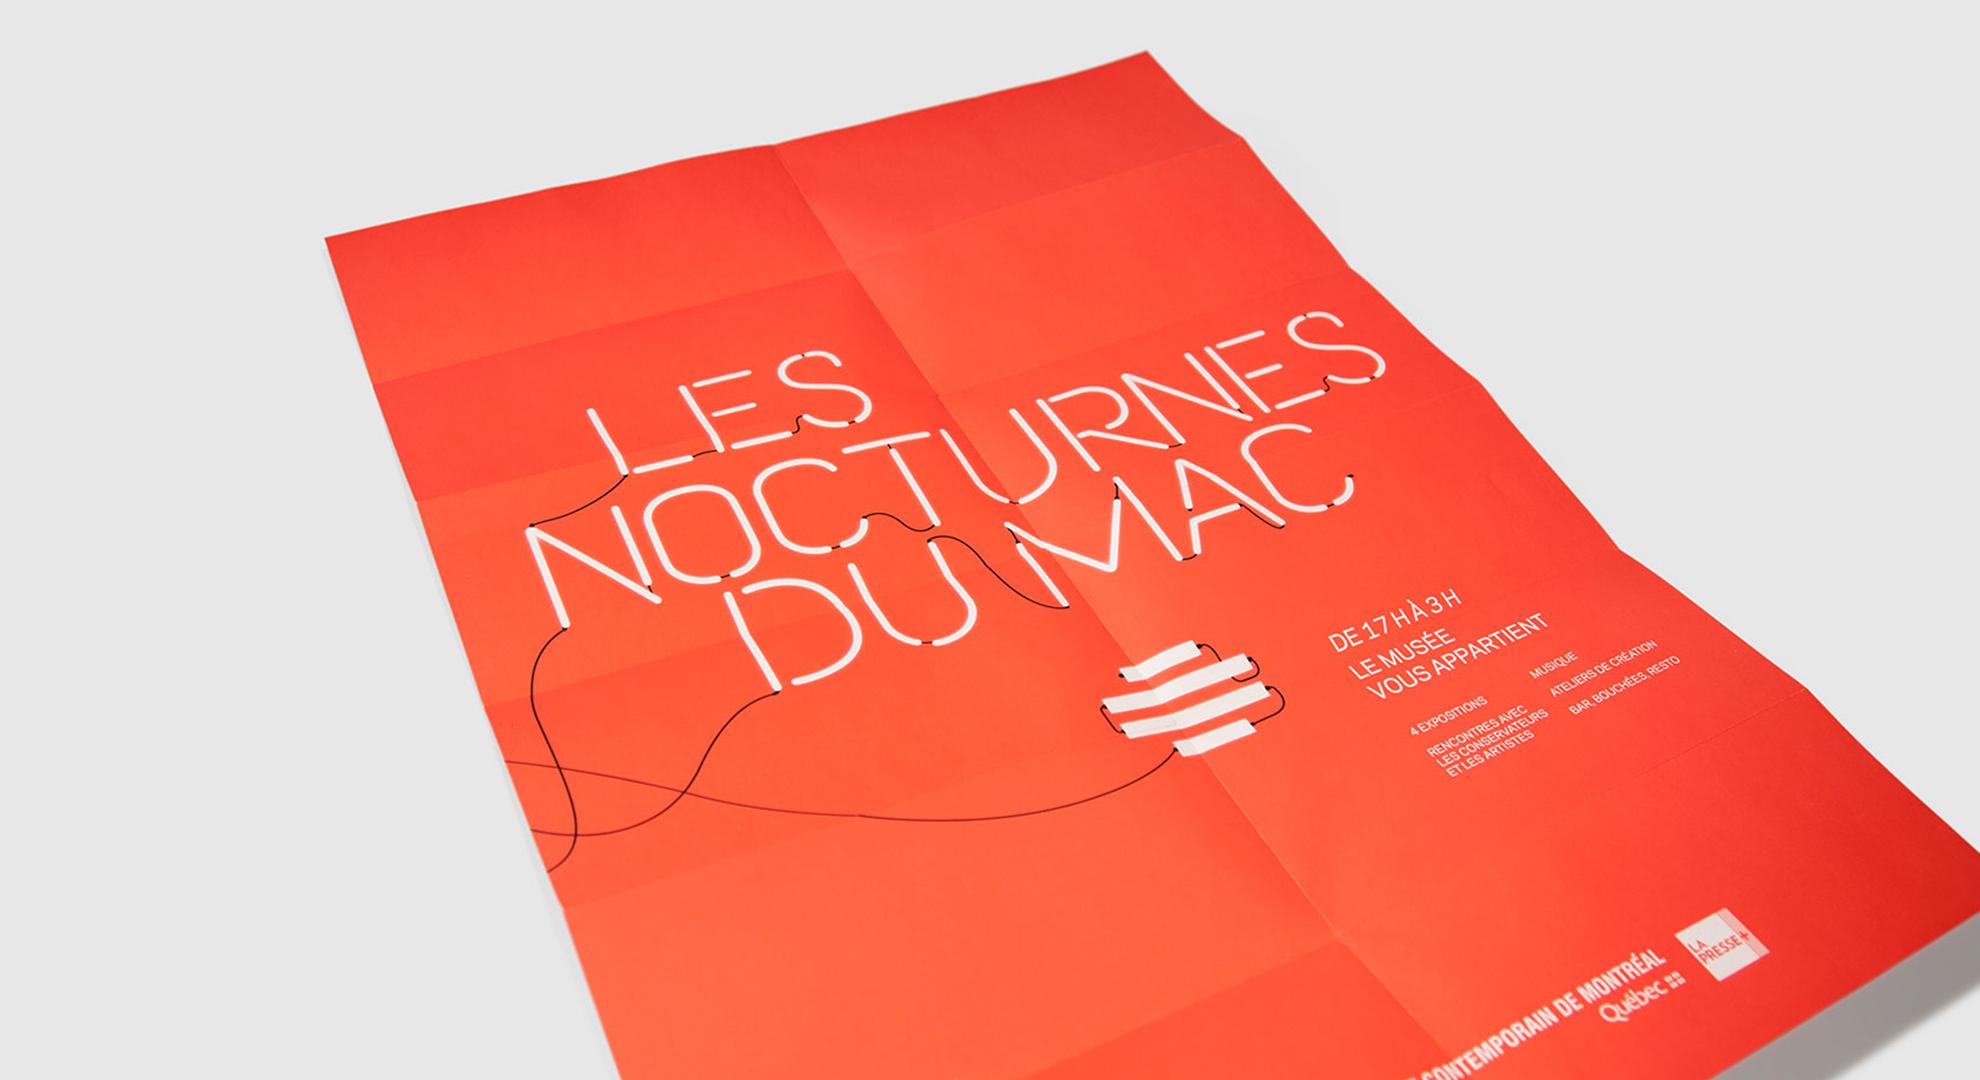 alix+neyvoz+nocturnes+musée+art+contemporain+neon+design+party+7.jpg